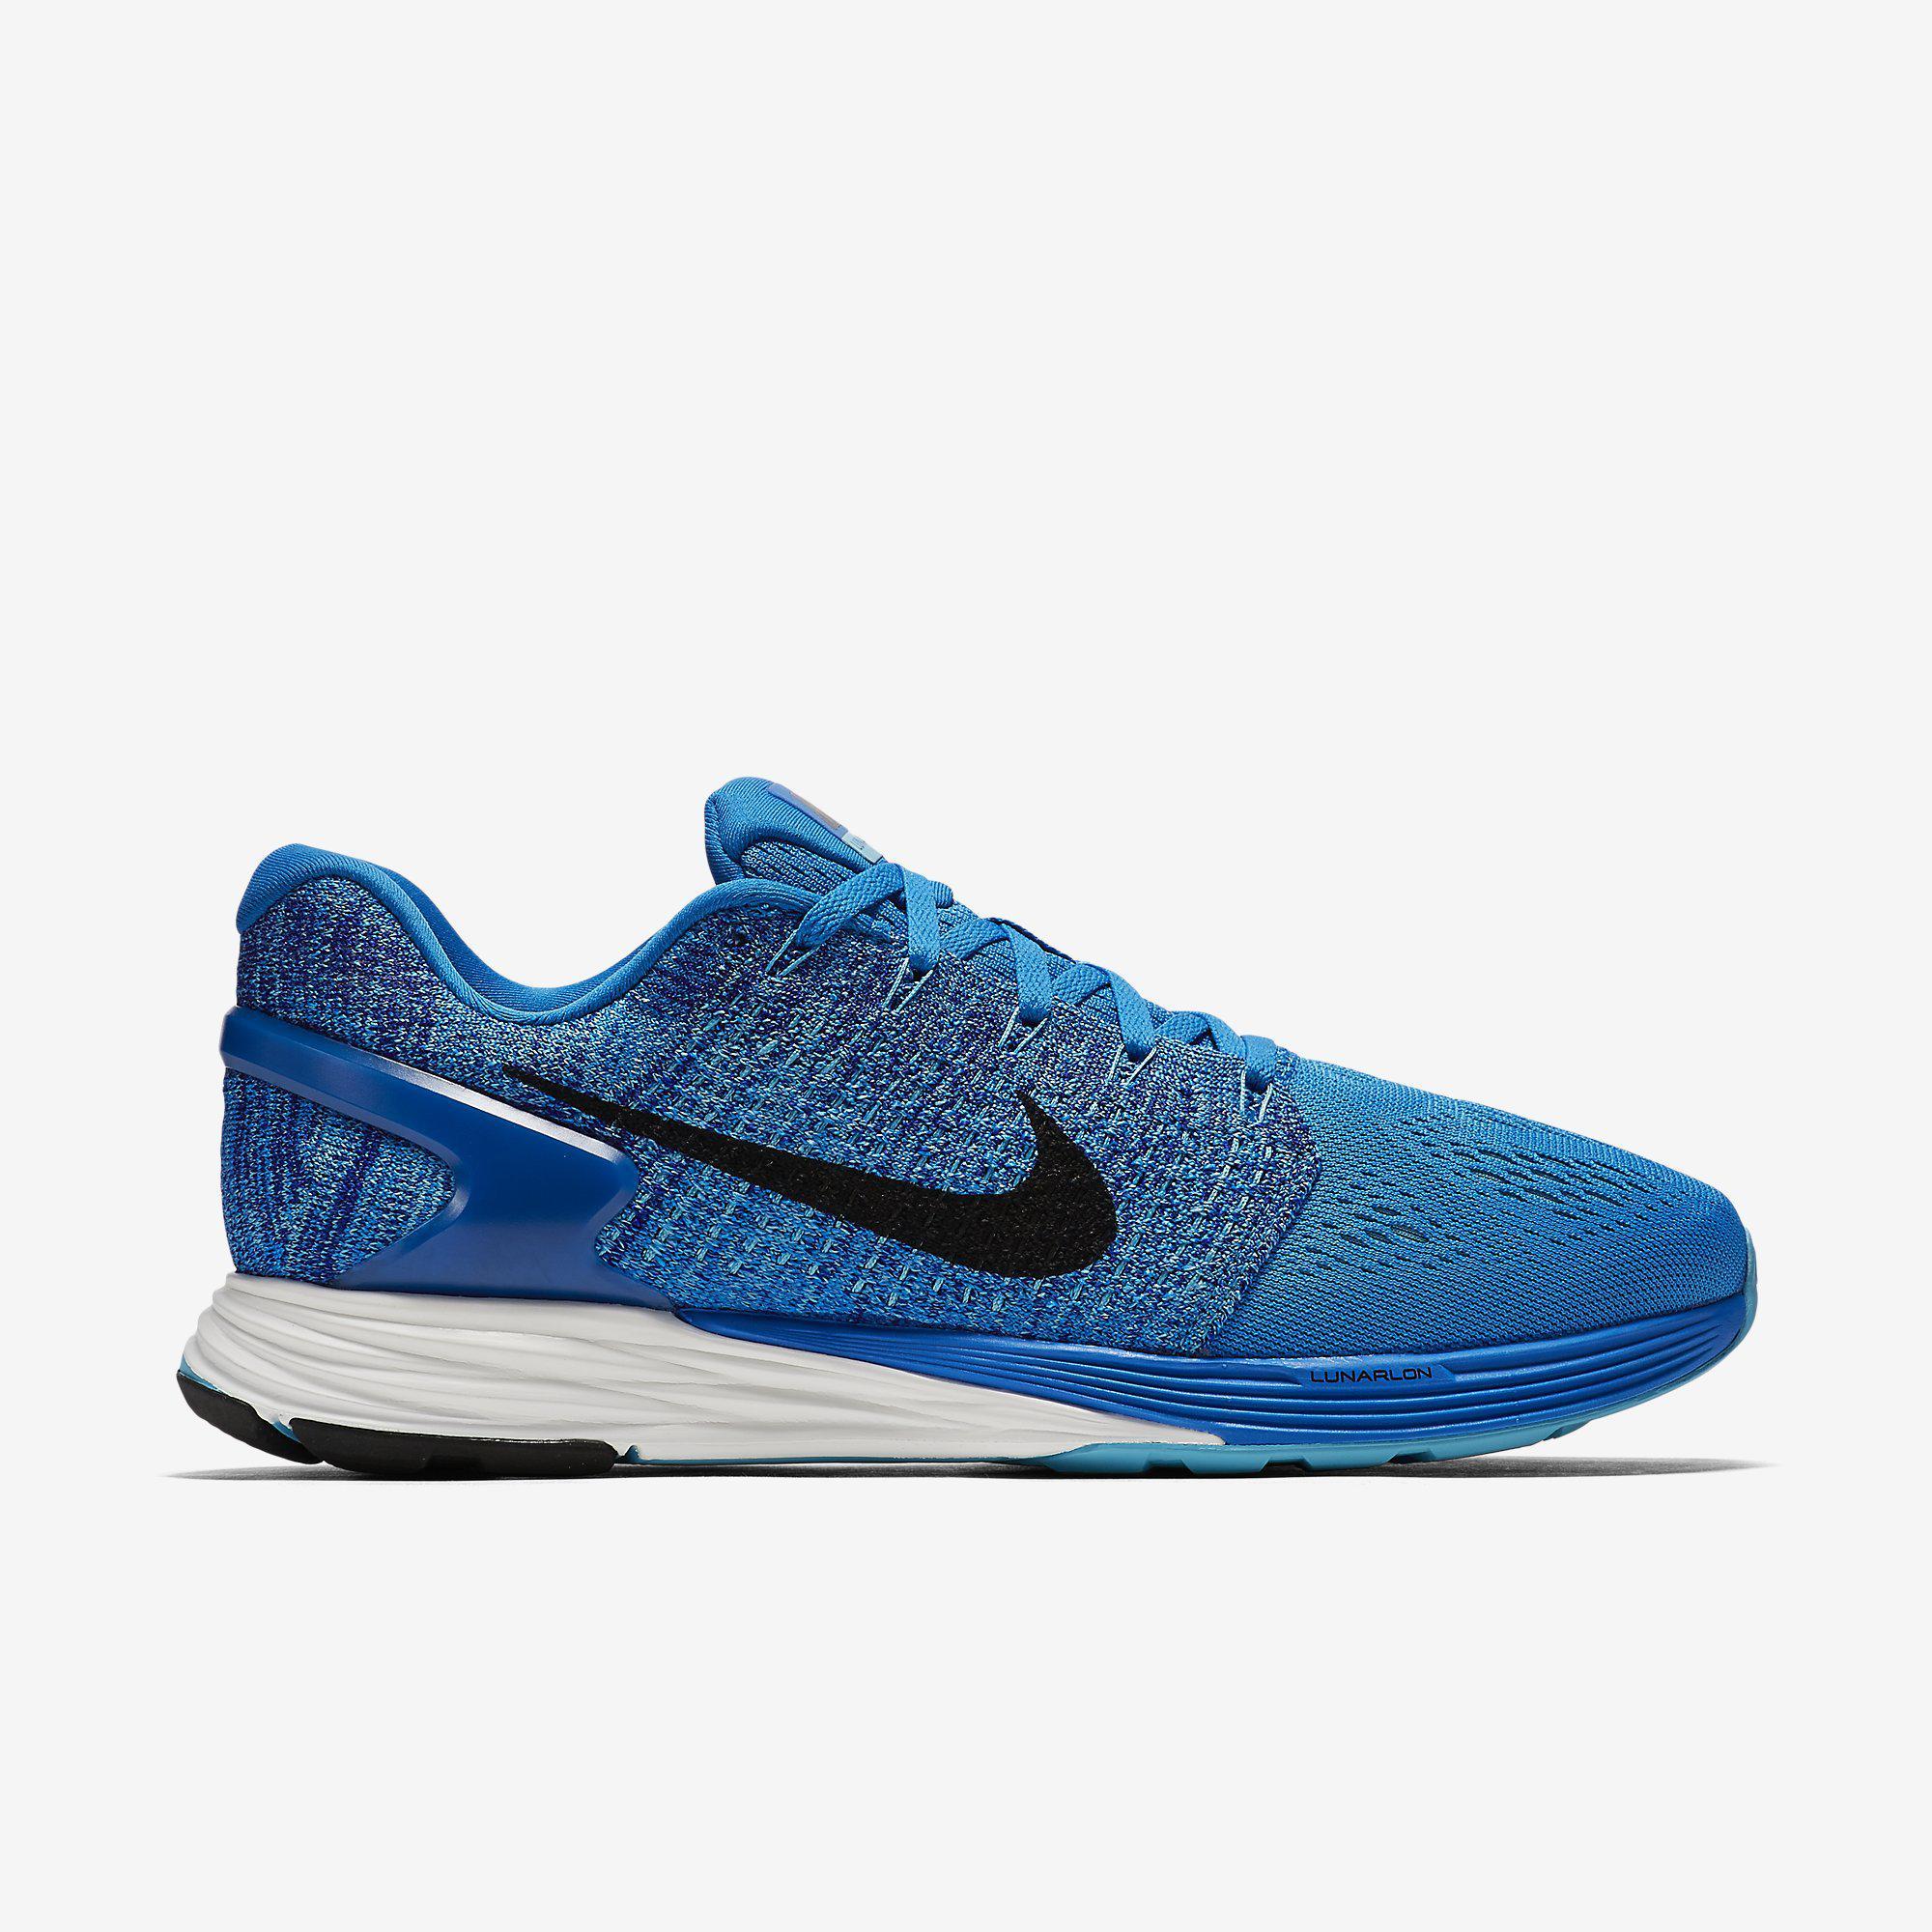 silencio Debilidad Elocuente  Nike Mens LunarGlide 7 Running Shoes - Blue - Tennisnuts.com